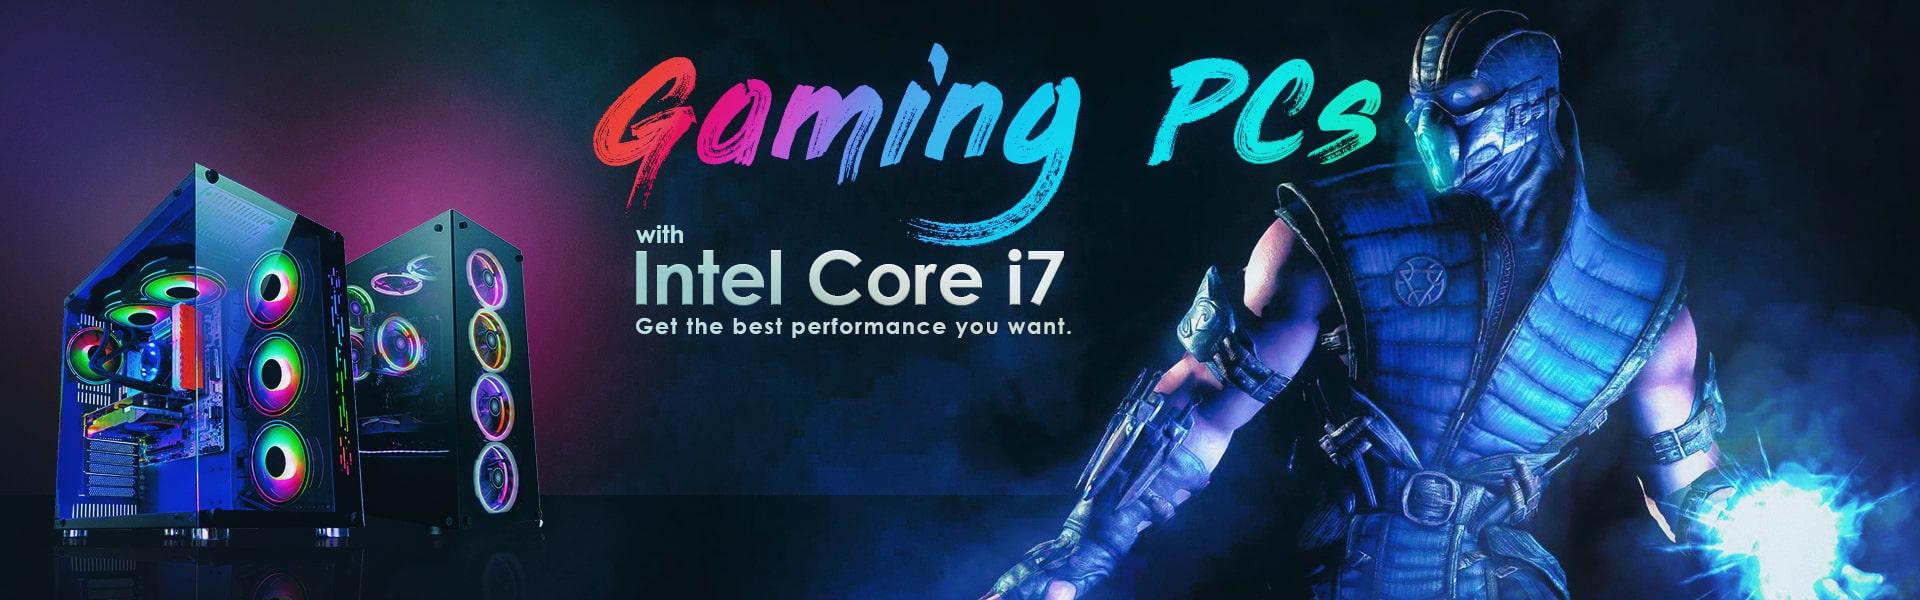 Intel i7 Gaming PCs